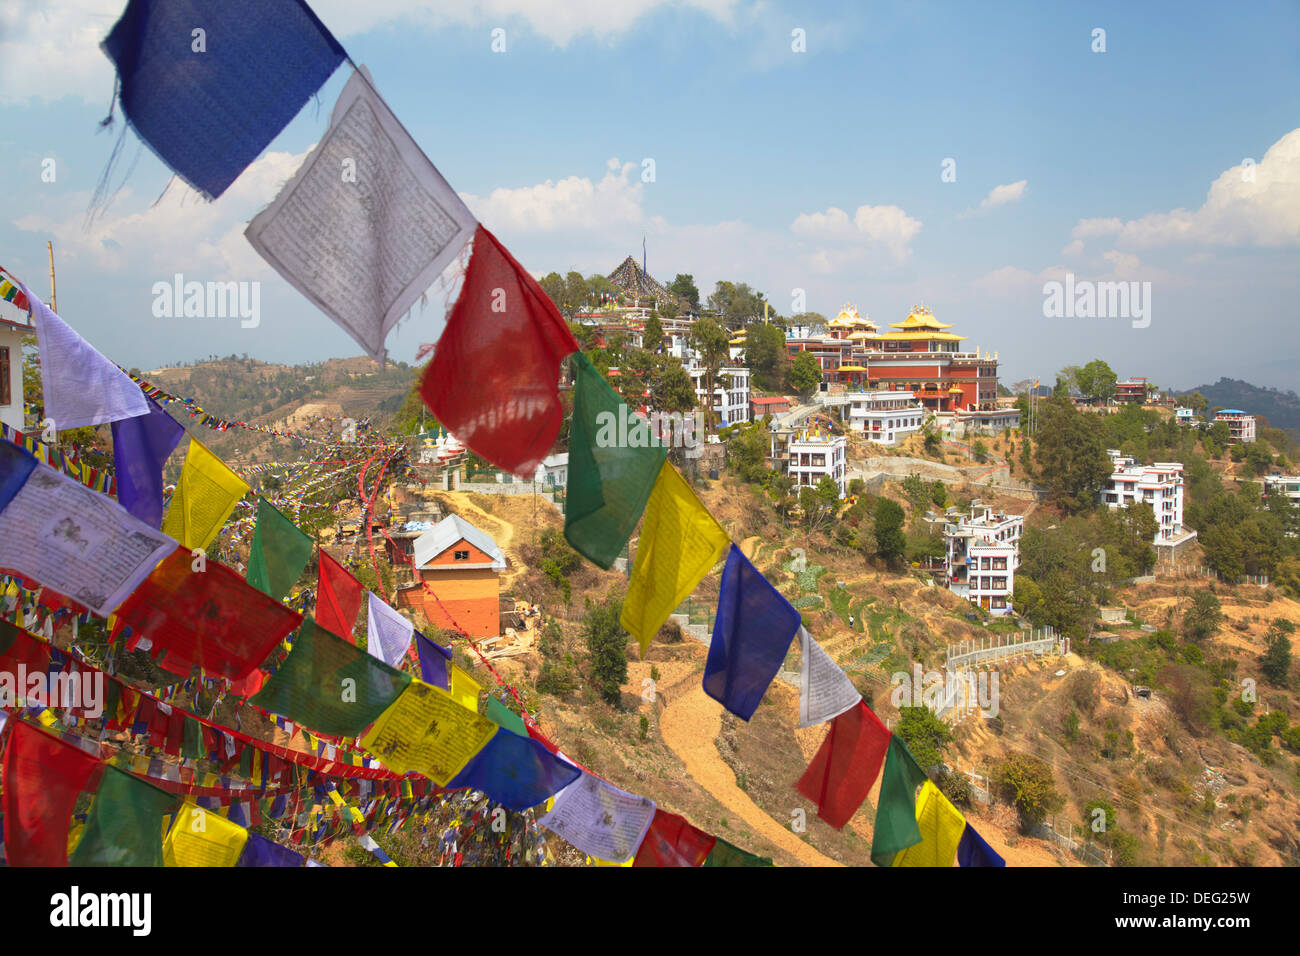 L'intérieur du monastère Thrangu Tashi Yangtse Namobuddha, complexe Dhulikhel, Vallée de Kathmandou, Népal, Asie Photo Stock